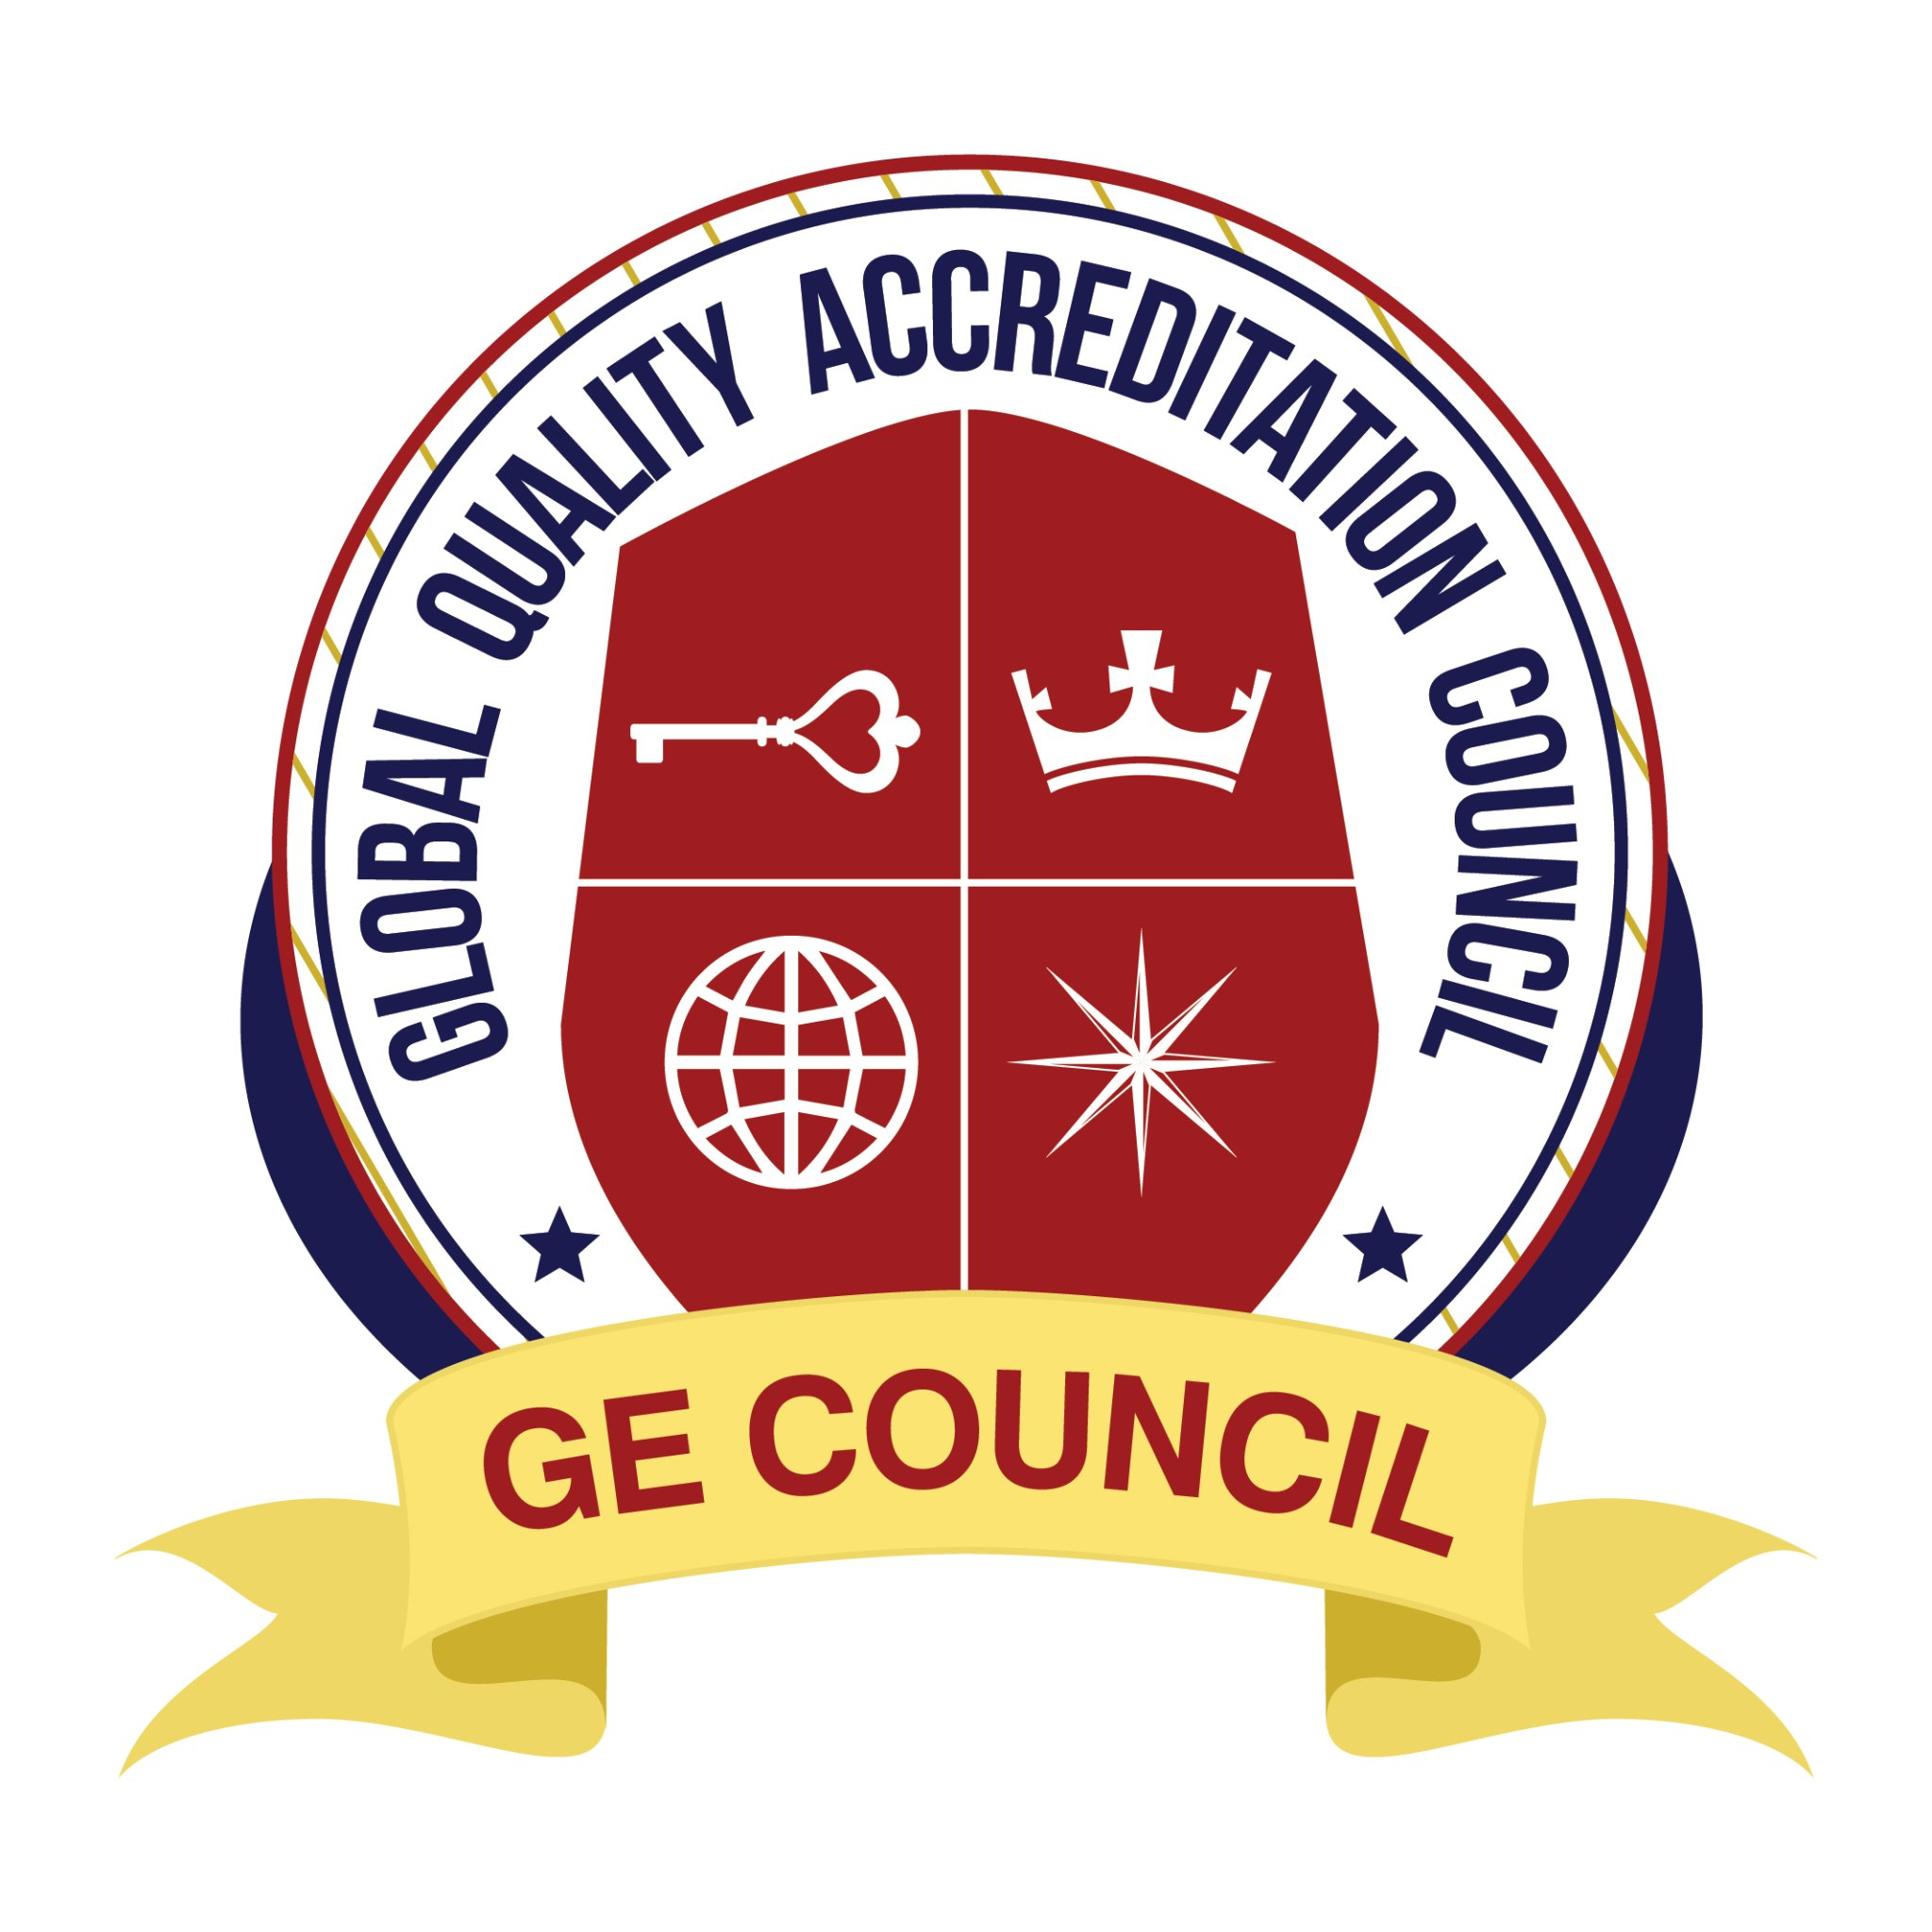 Ge council gecouncilnews twitter ge council 1betcityfo Choice Image